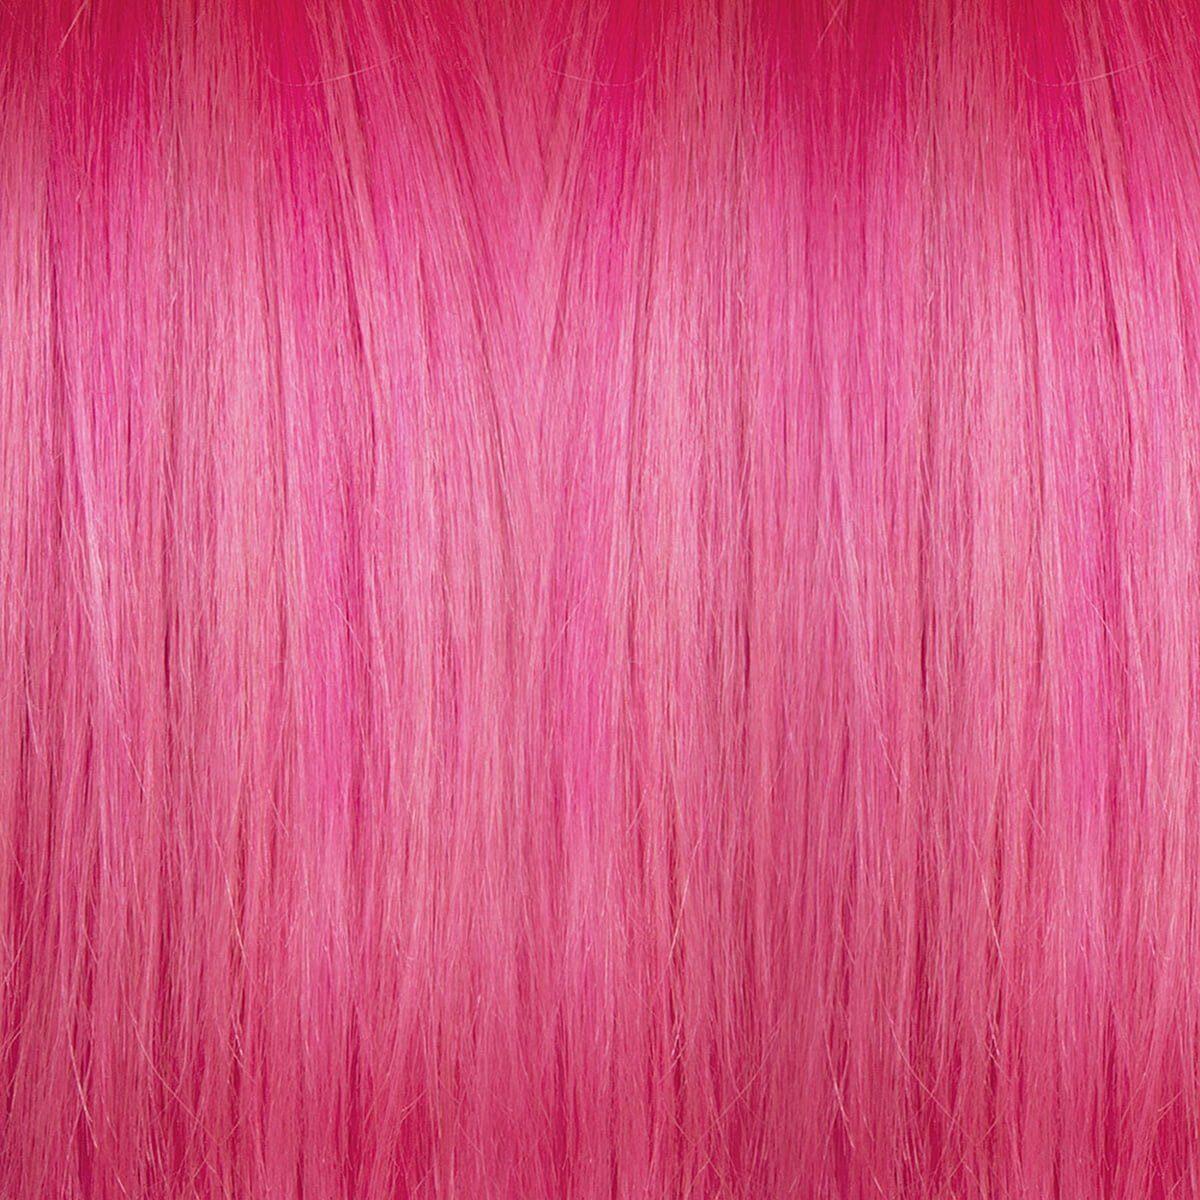 manic panic high voltage rosa uv hårfarge 118 ml cotton candy pink swatch 54501